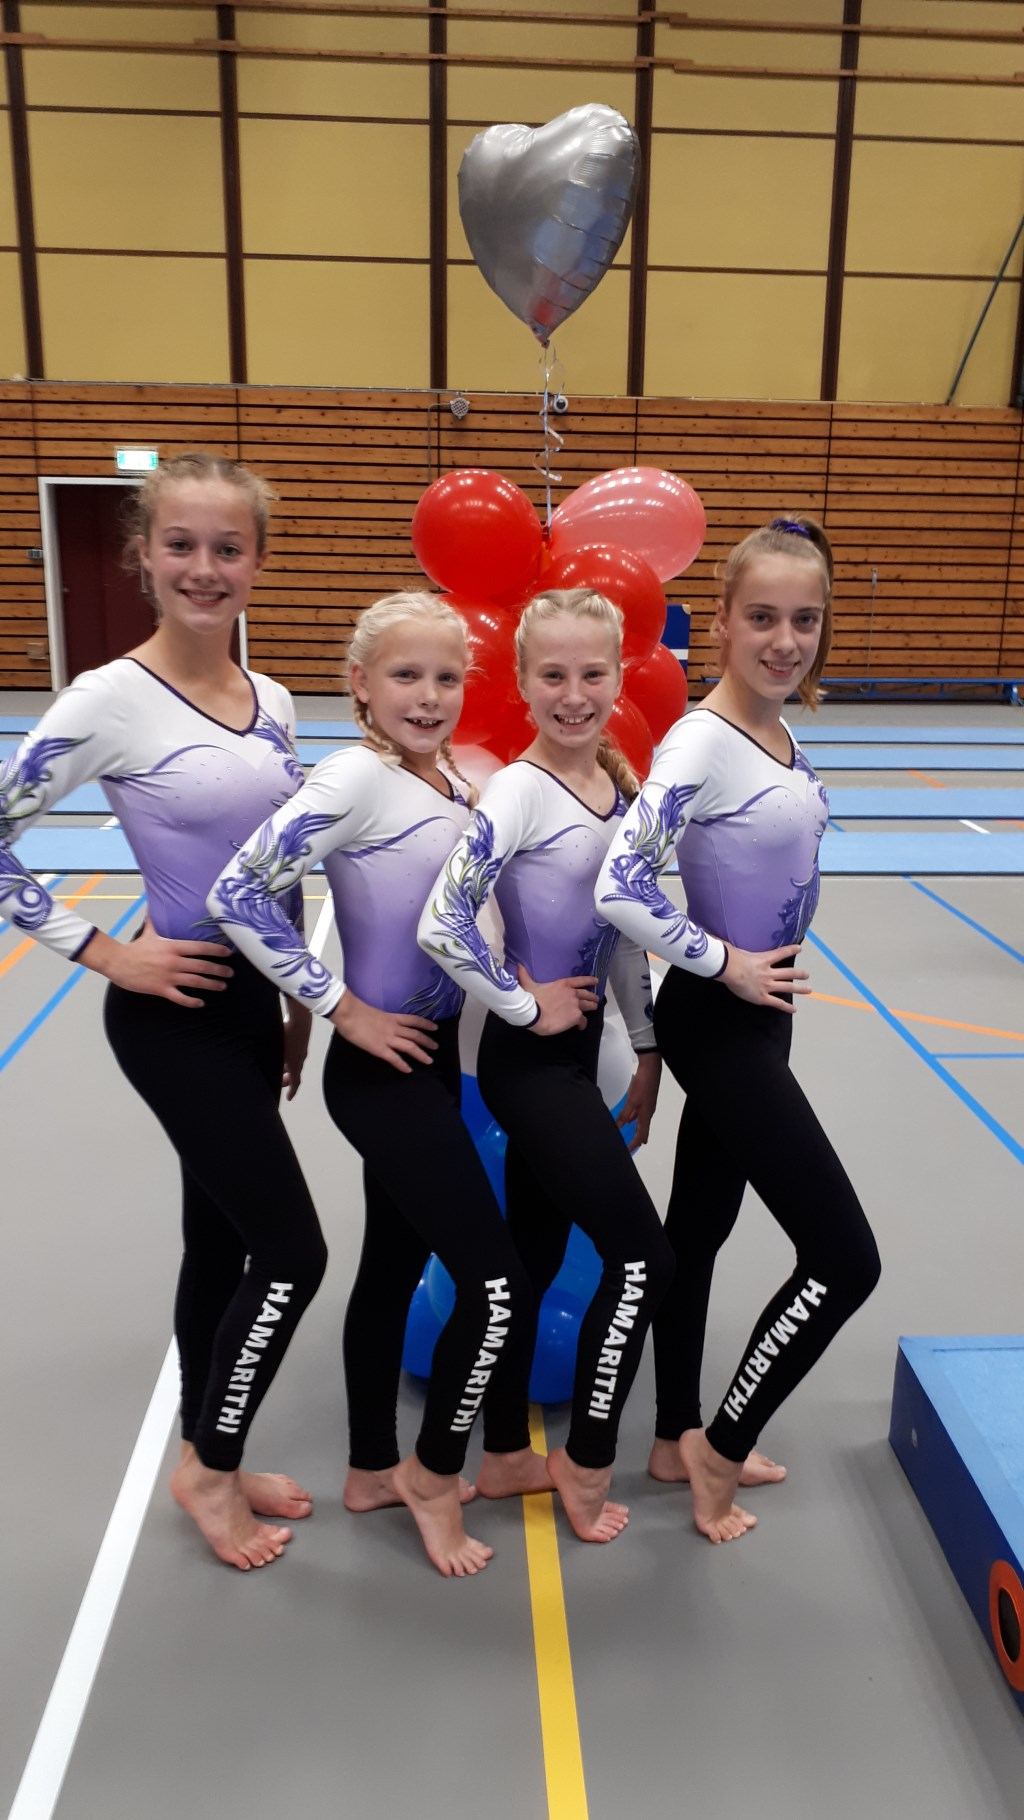 • Valérie Brandsma, Janinka Egas, Hannah van Boggelen en Nayinthe van den Heuvel. Foto: aangeleverd © Bommelerwaard